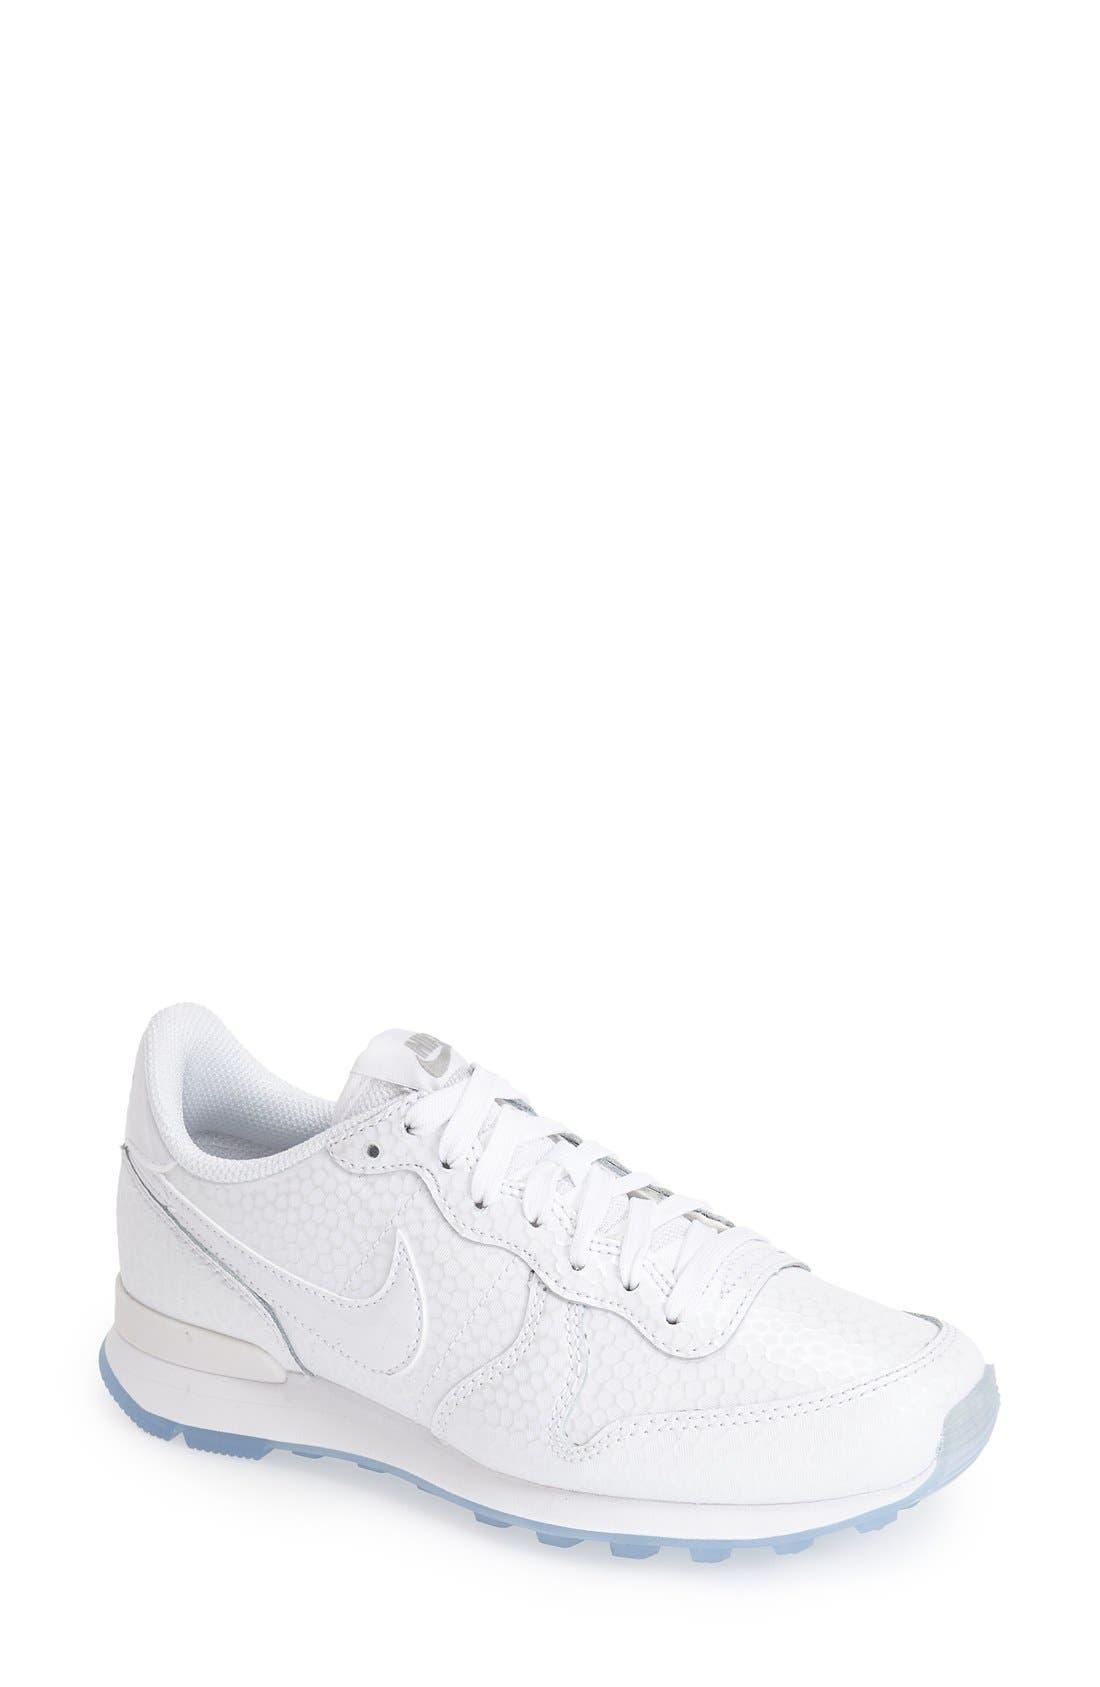 Alternate Image 1 Selected - Nike 'Internationalist PRM' Sneaker (Women)